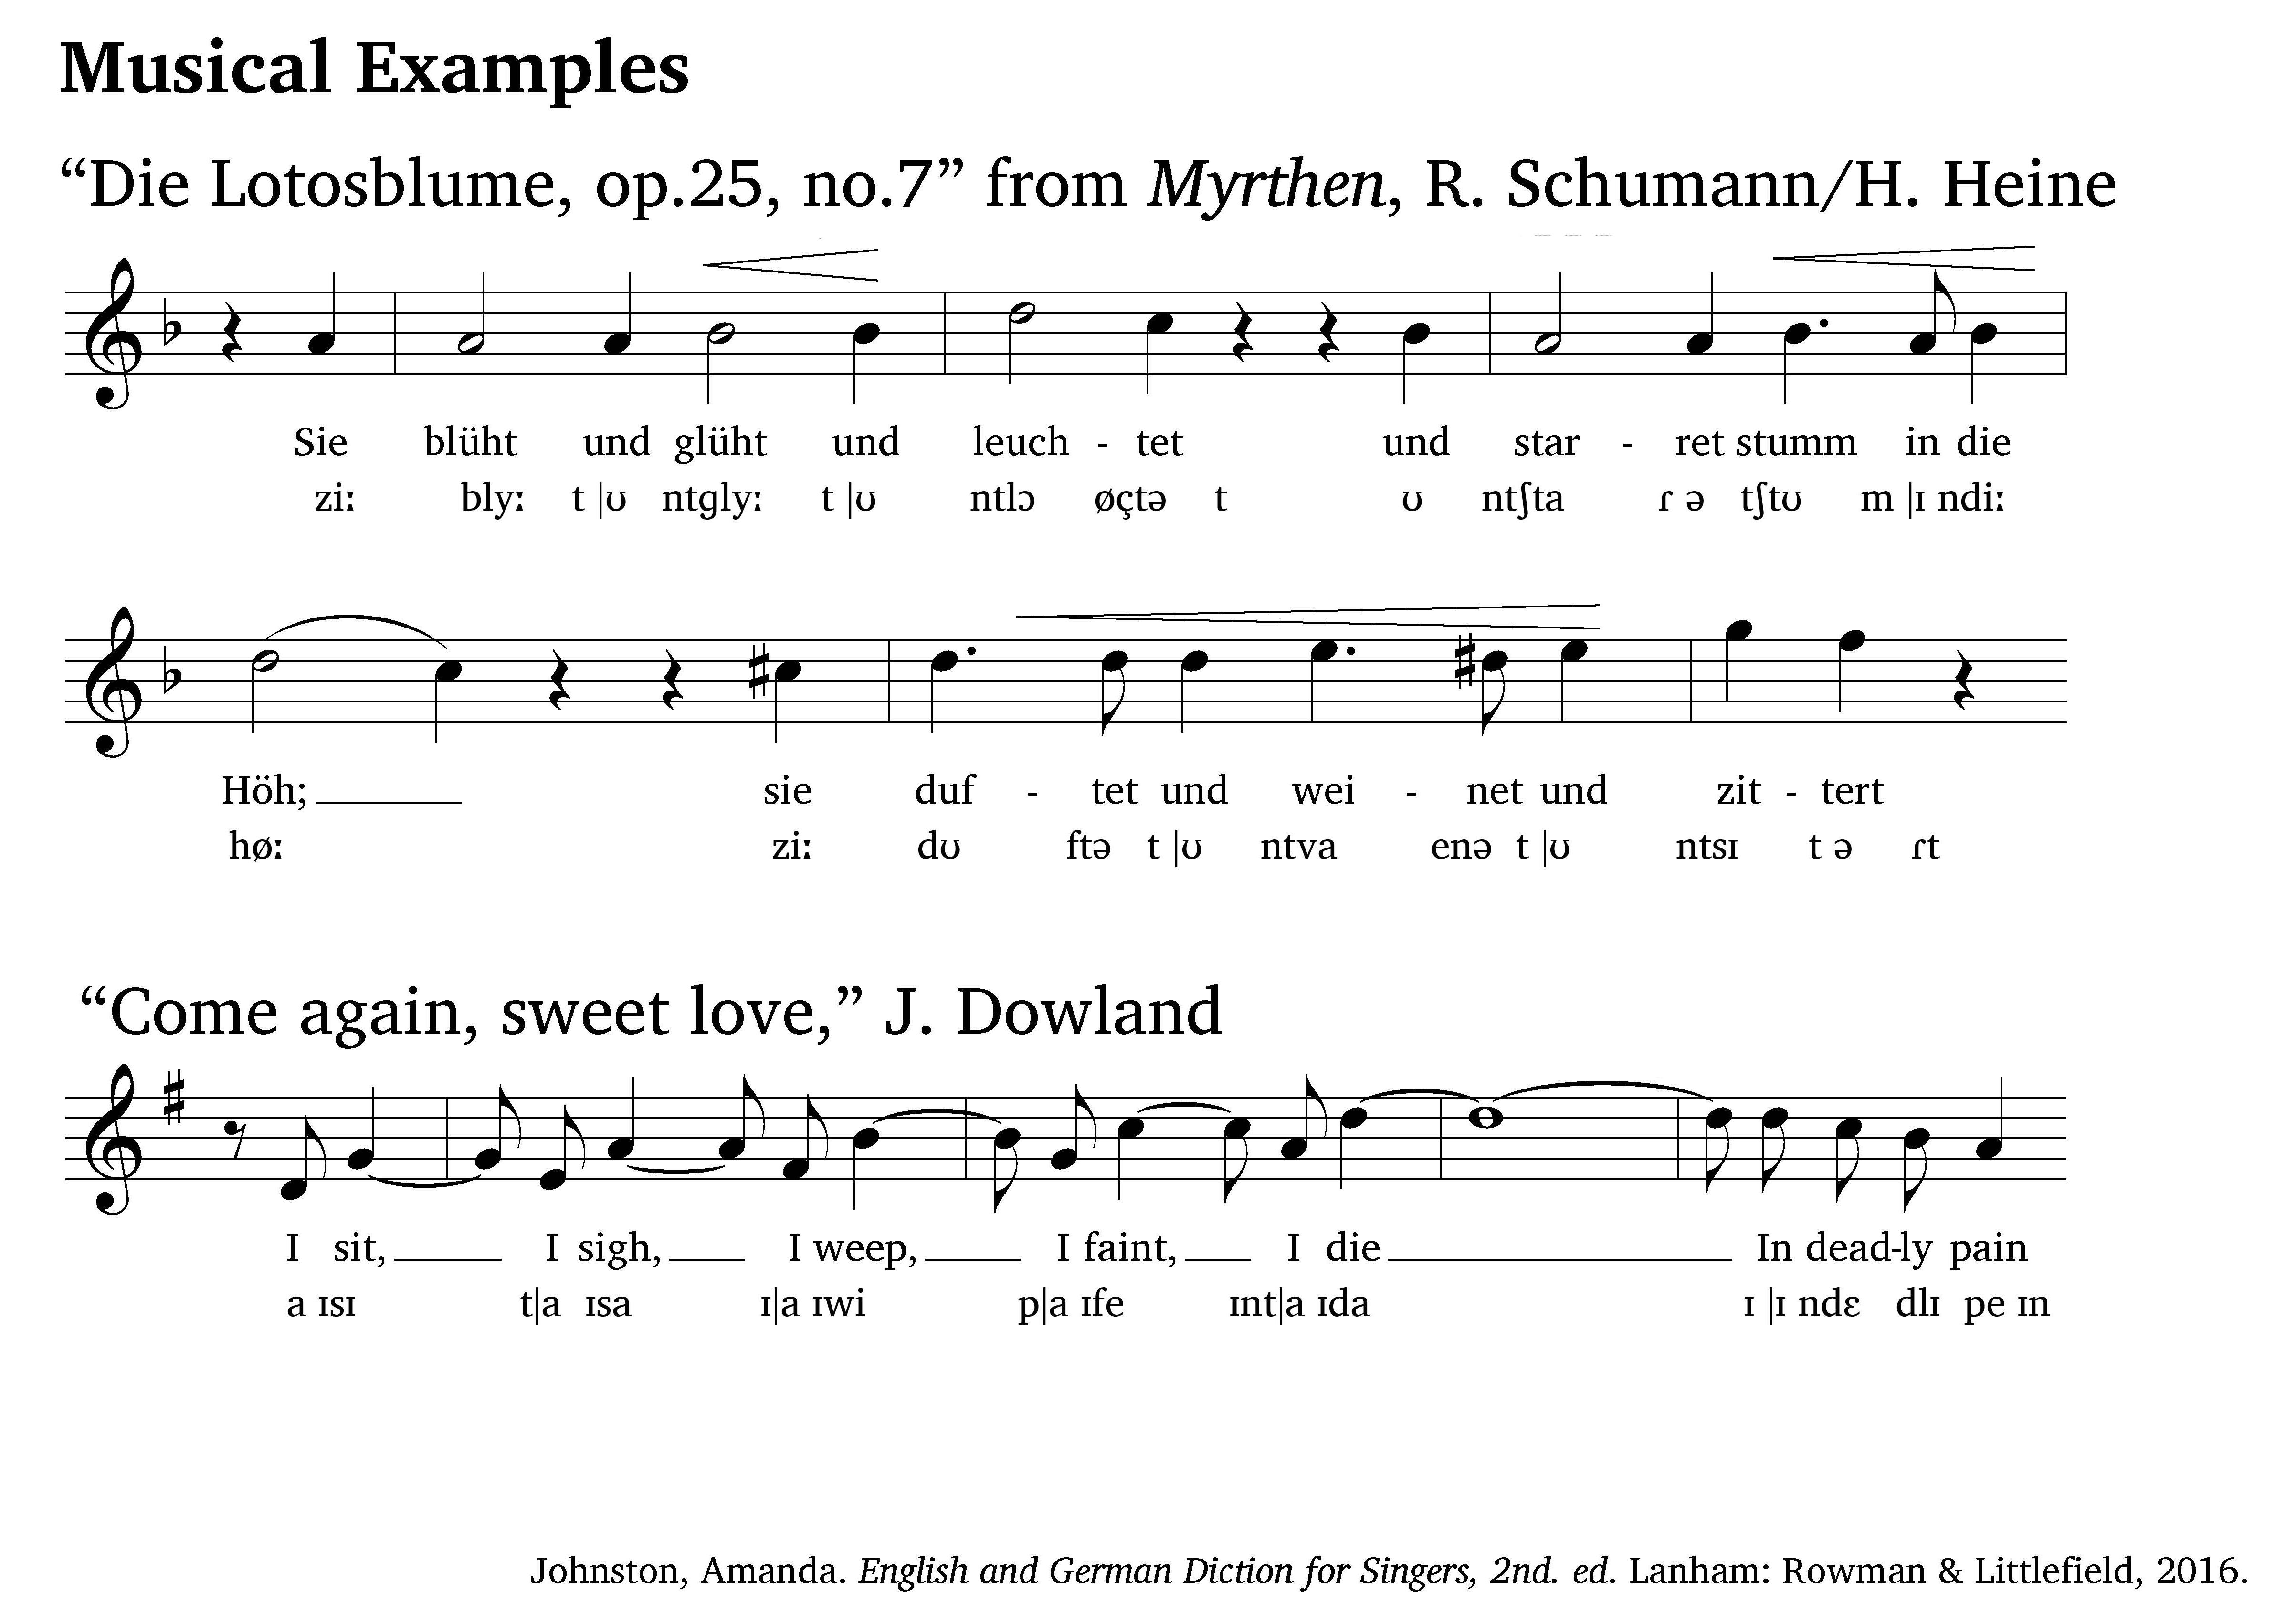 Amanda_Johnston_-_Musical_Examples.jpg